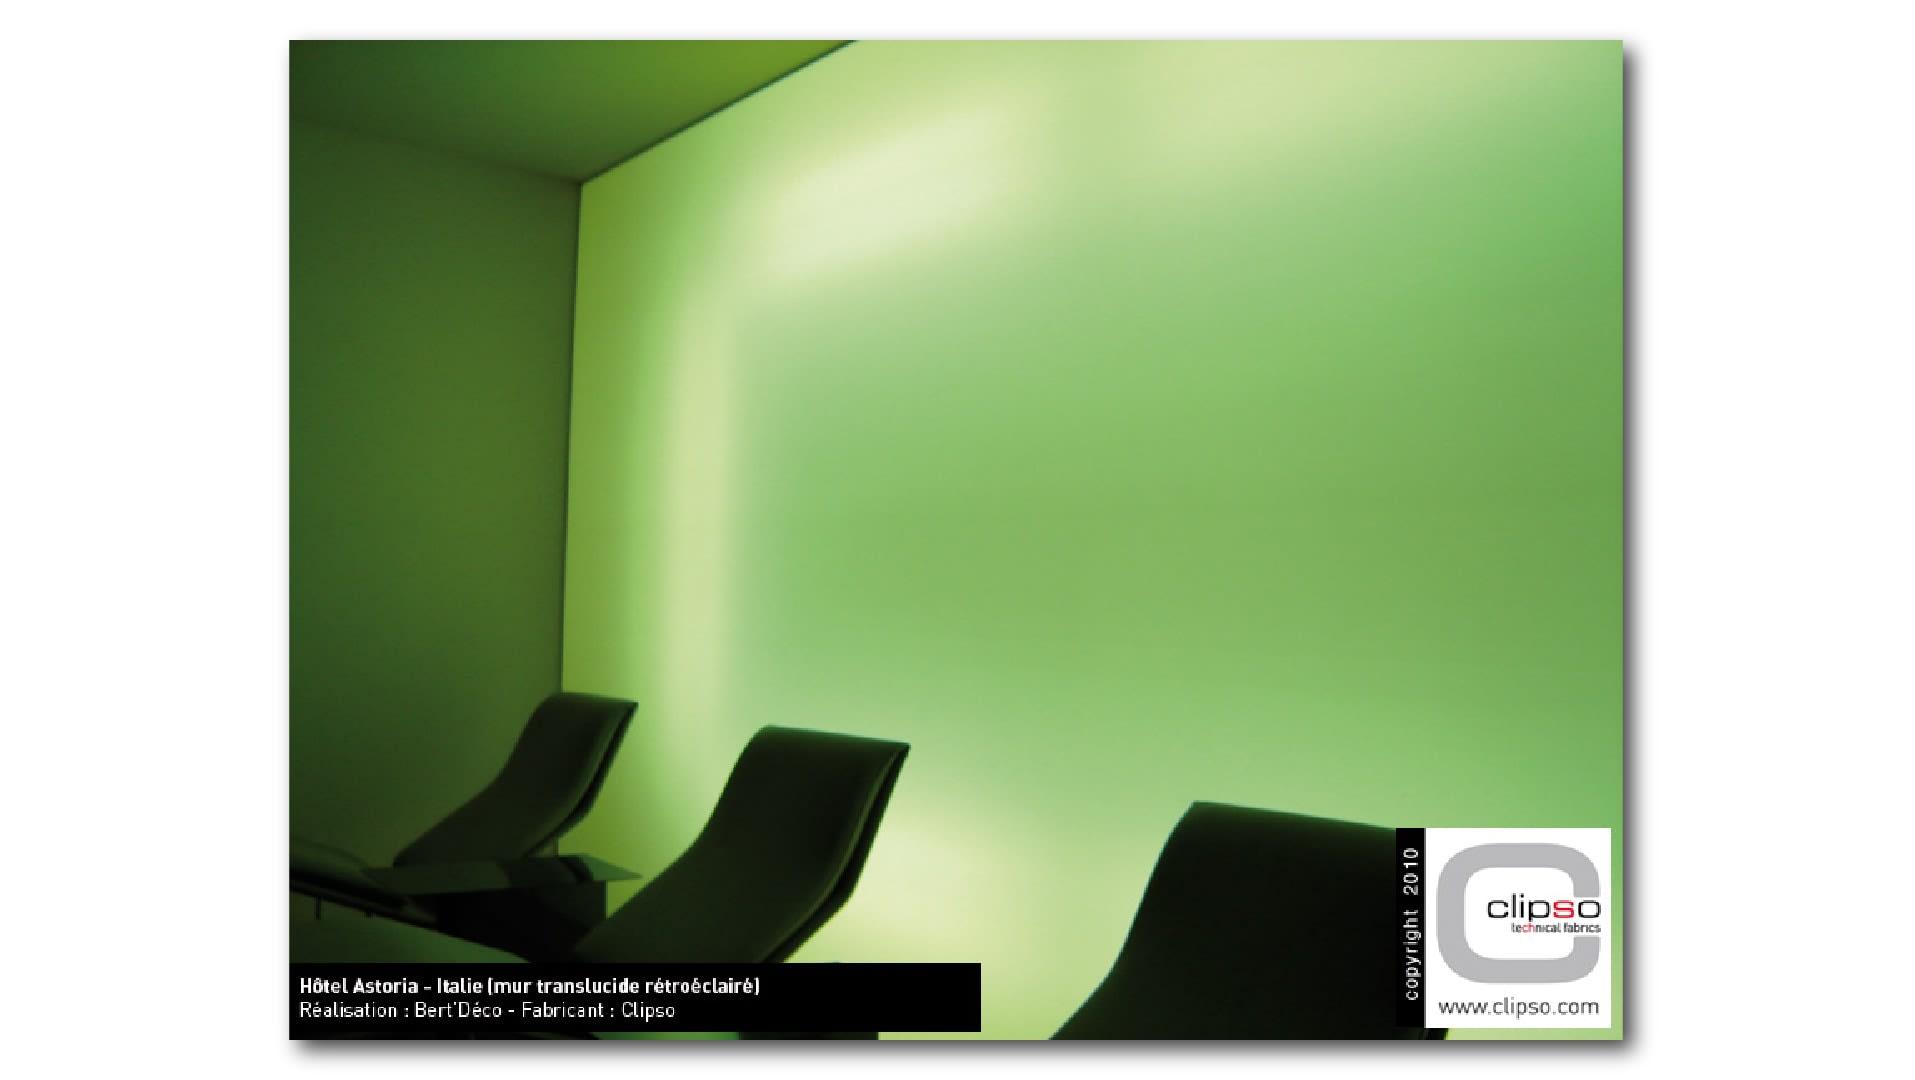 lounge-1-relanxen-lichtdusche-wellness-clipso-transluzent3-01_ckuvzn